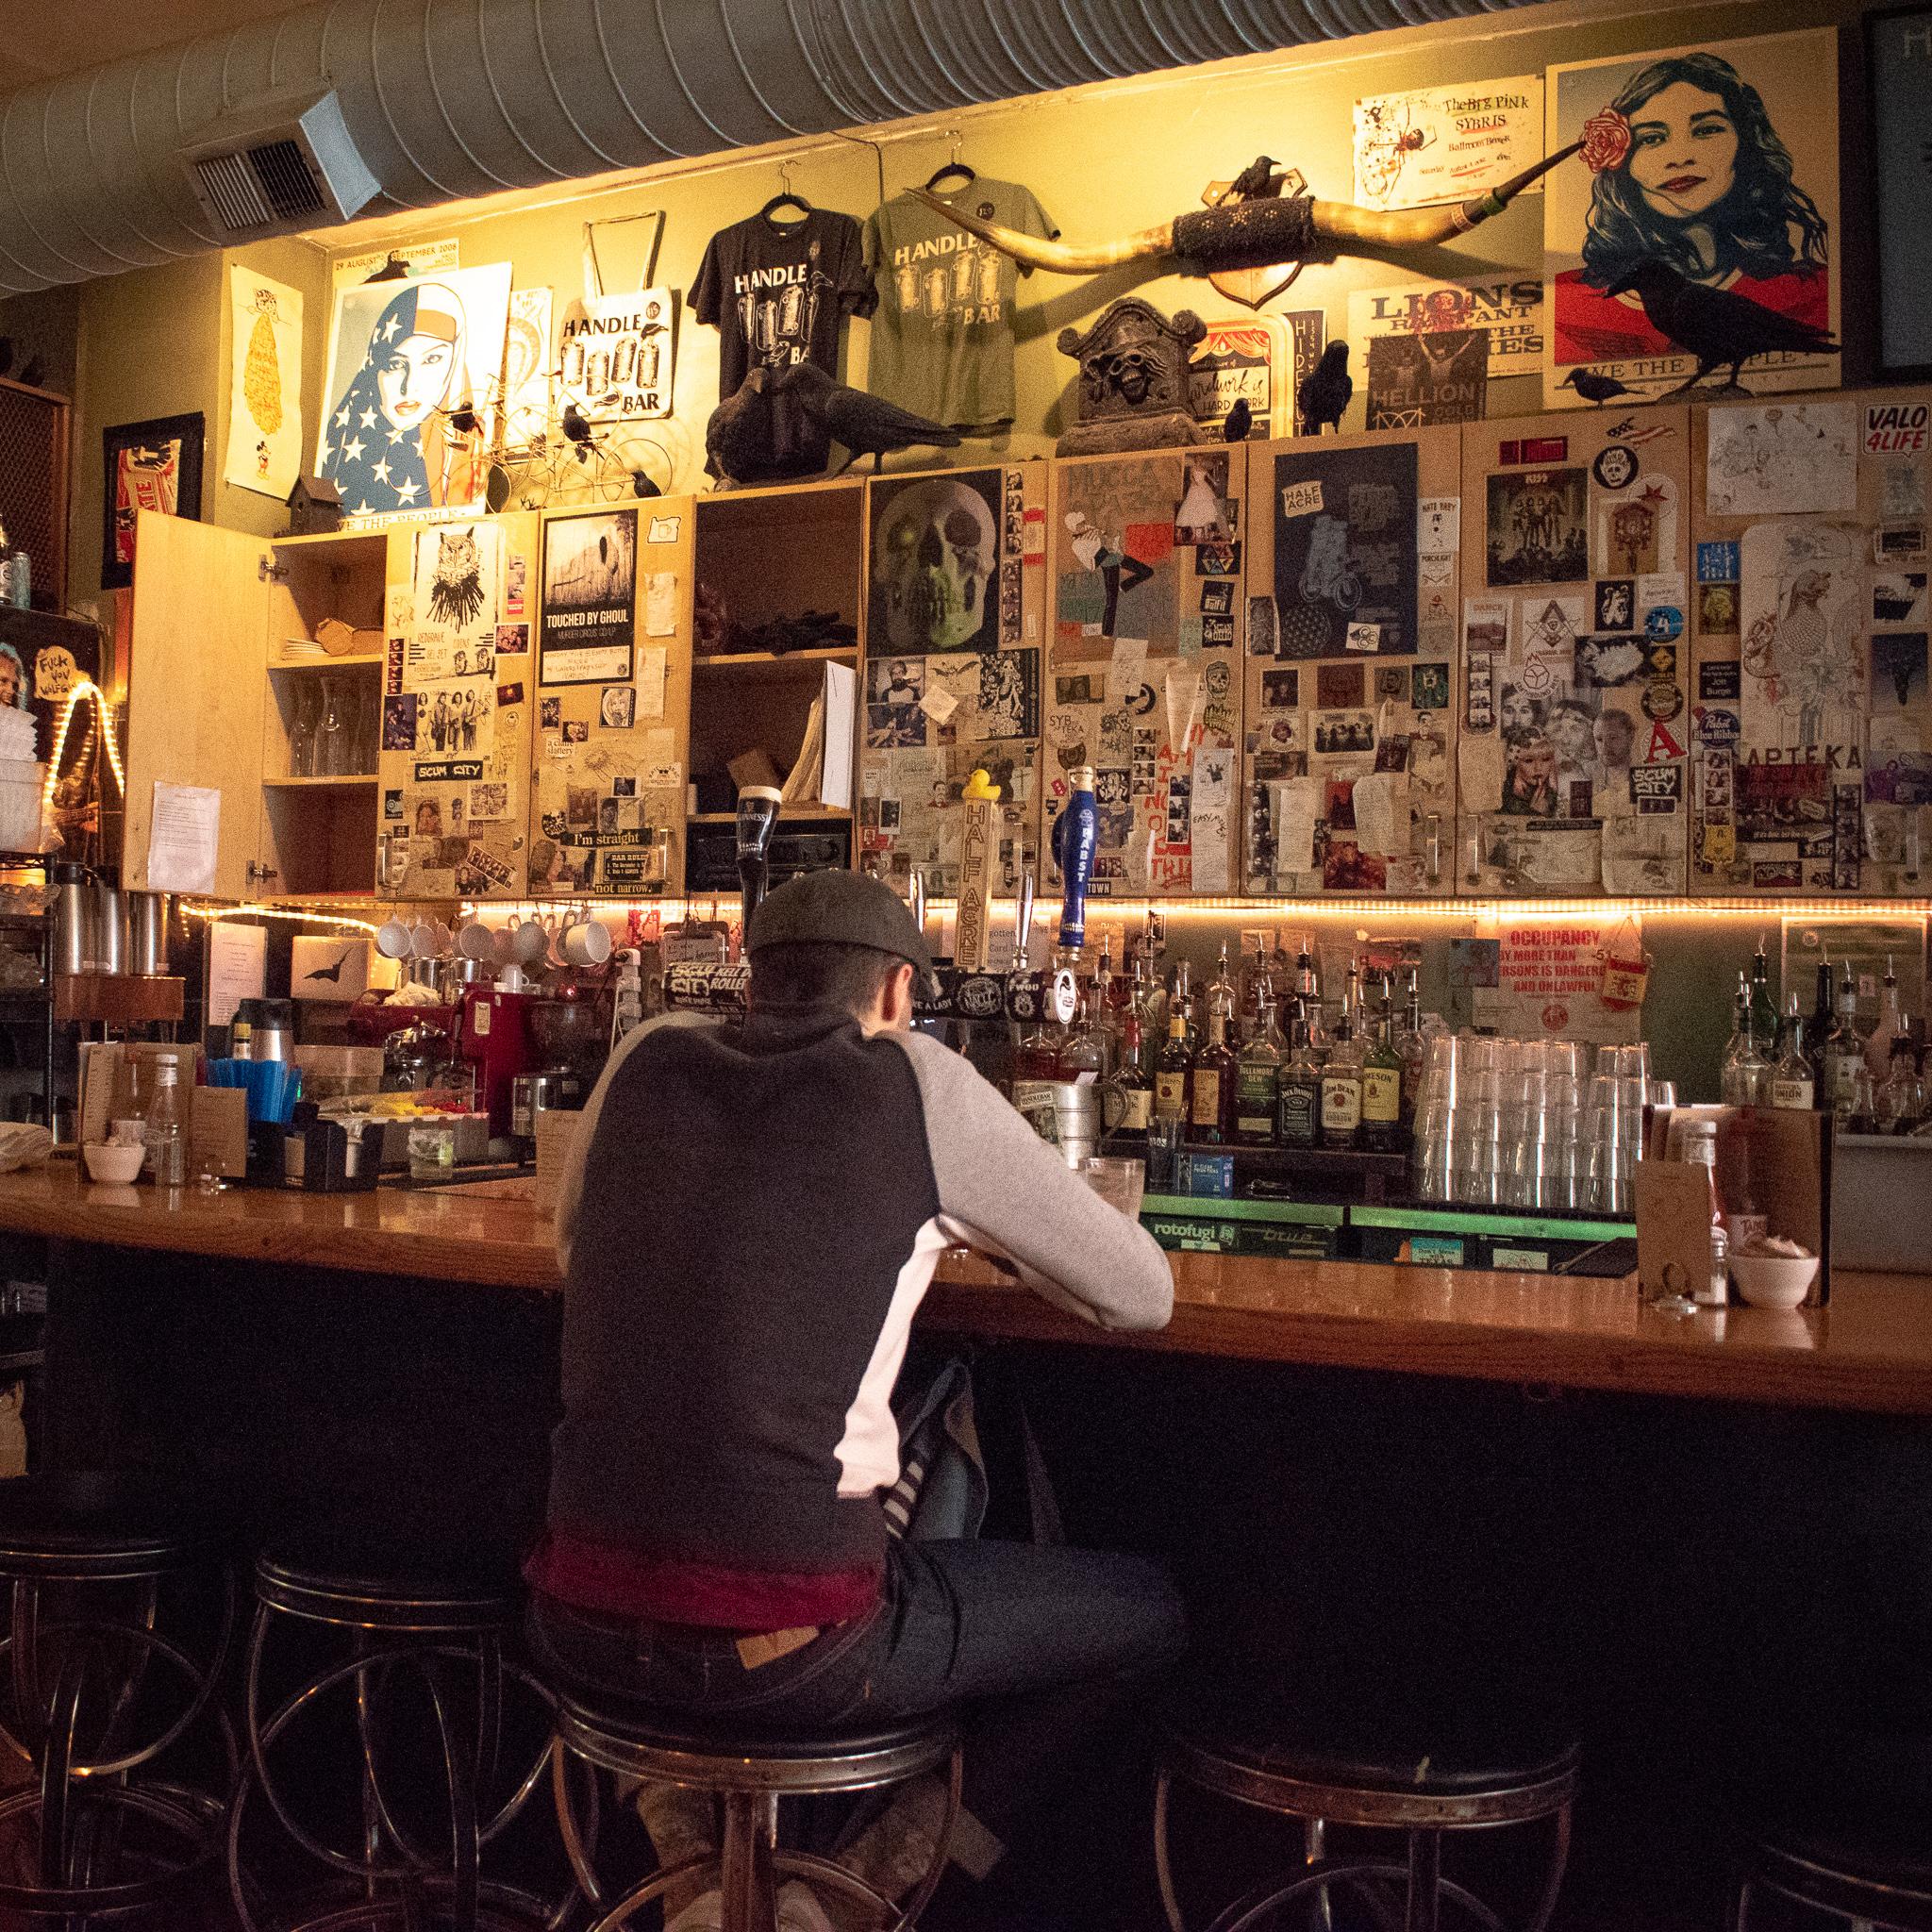 Uprooted-Traveler-Vegan-Food-Guide-Chicago-Handlebar-patron-bar.jpg